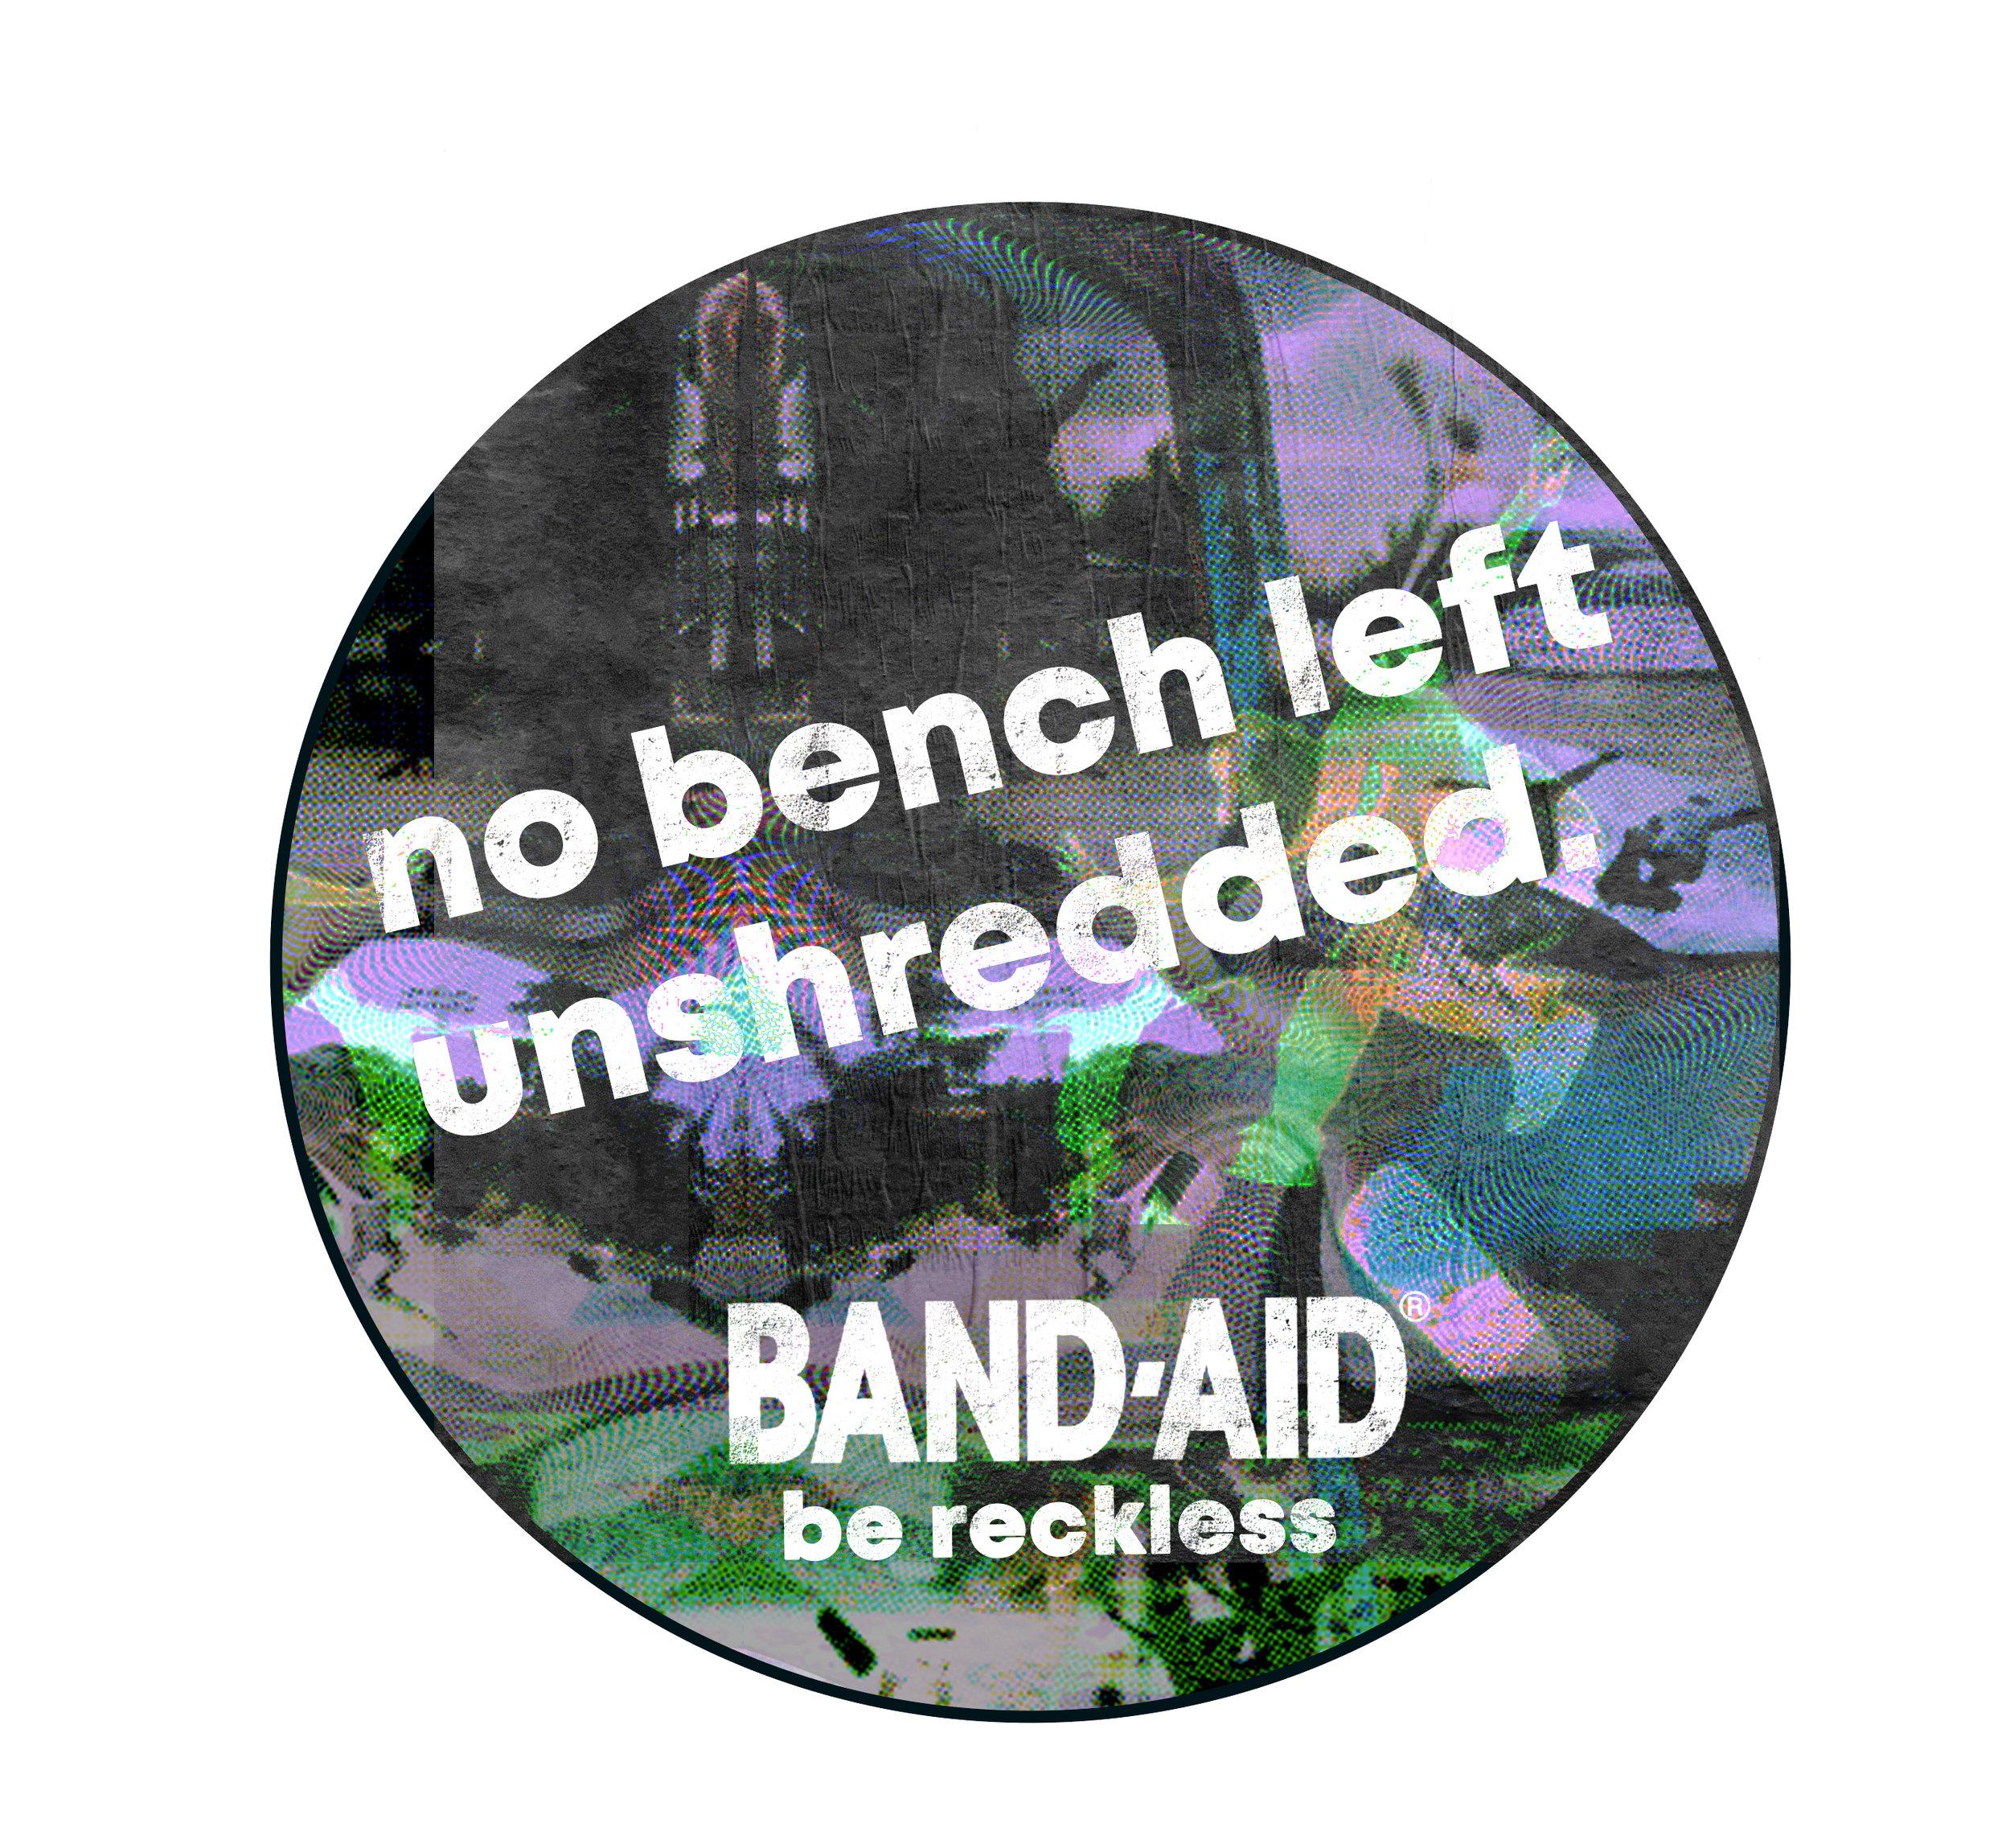 NO bench left unshredded final .jpg